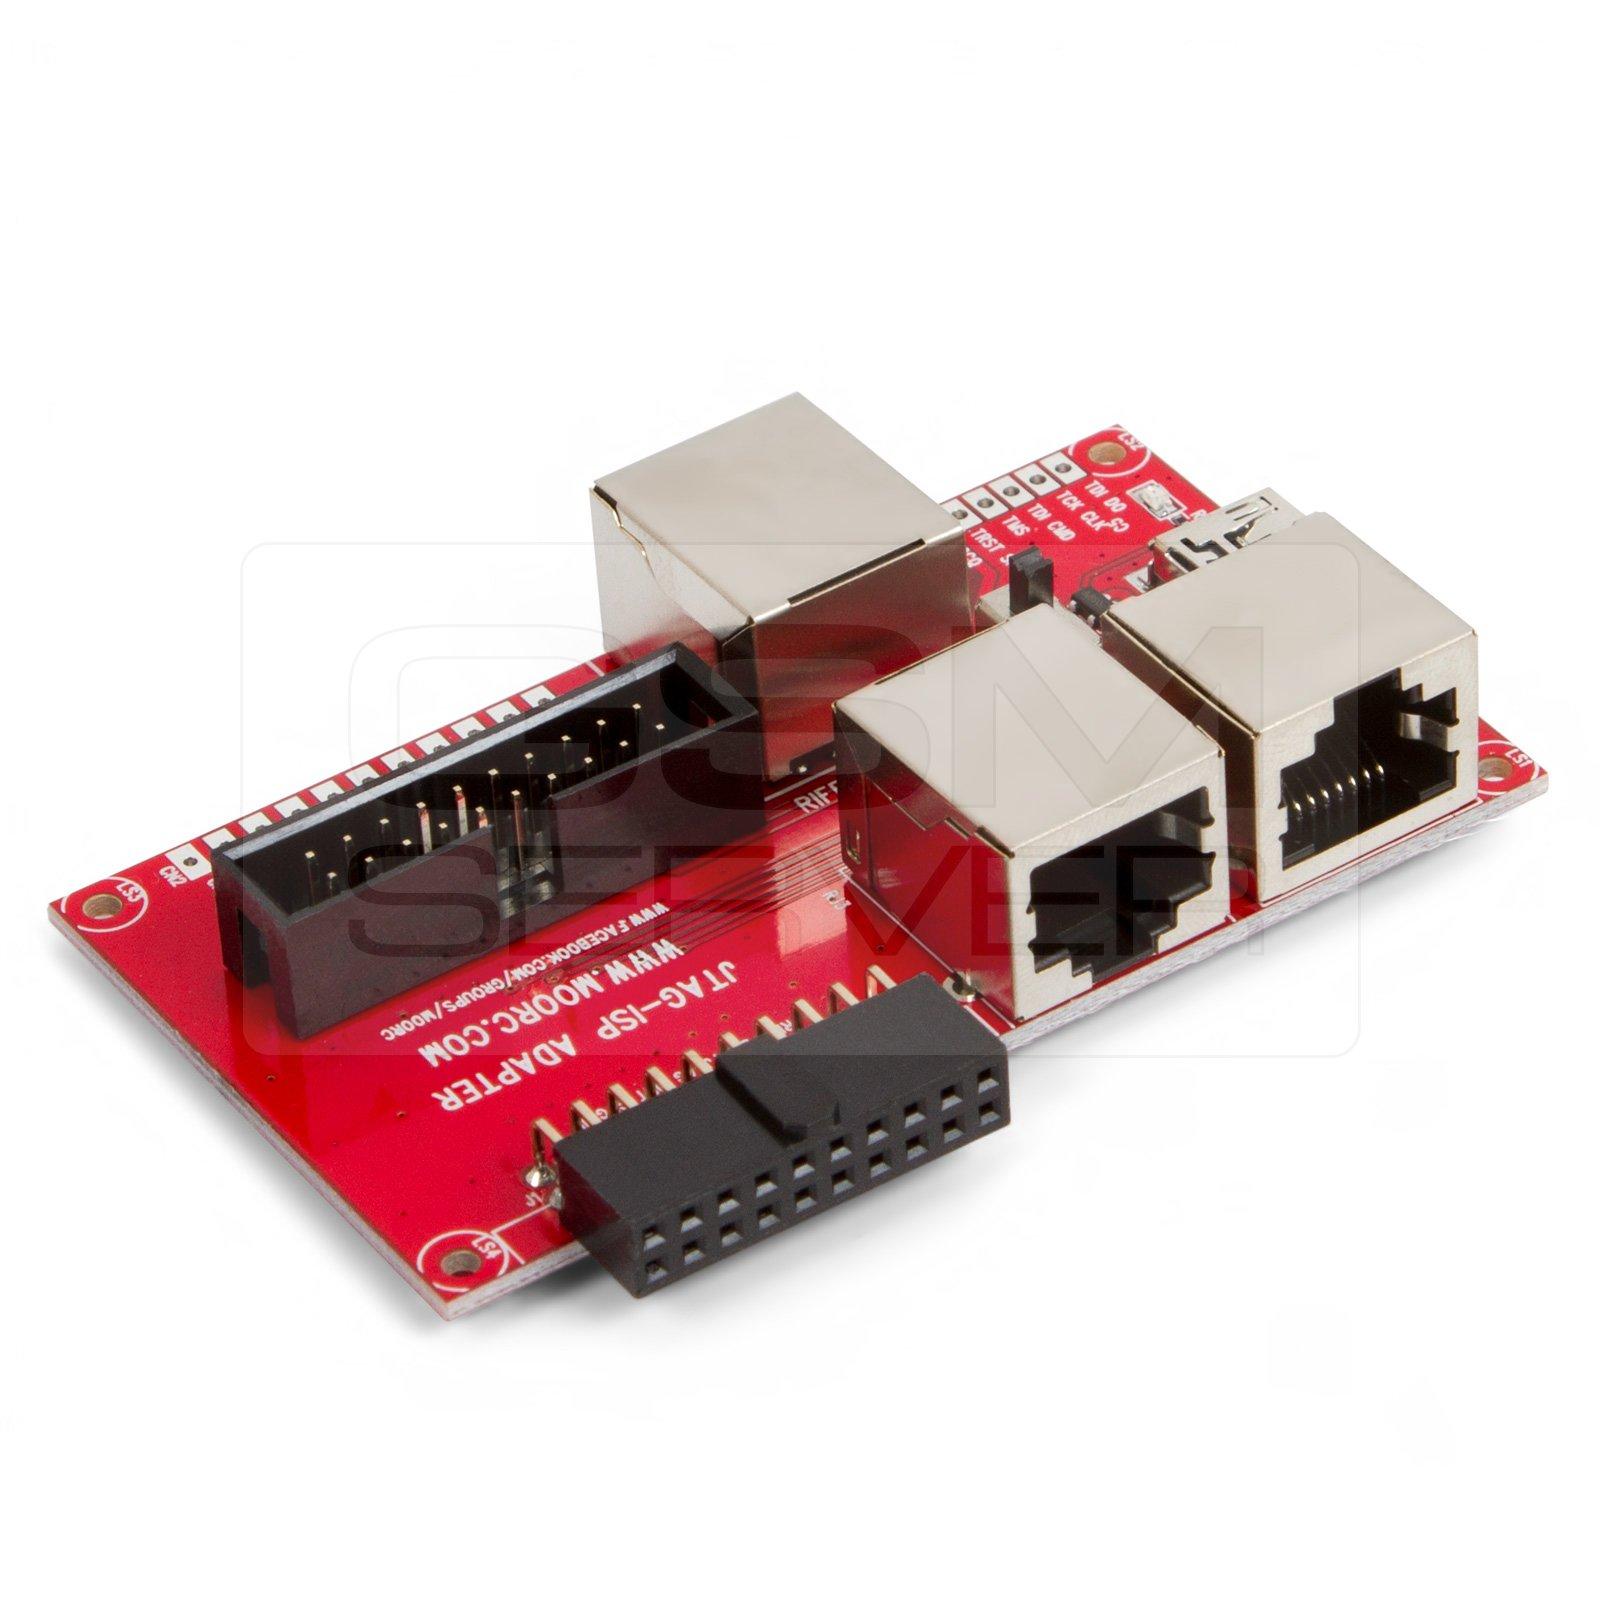 Programmator Hwk Ufs 2 Micro Poslednee Obnovlenie